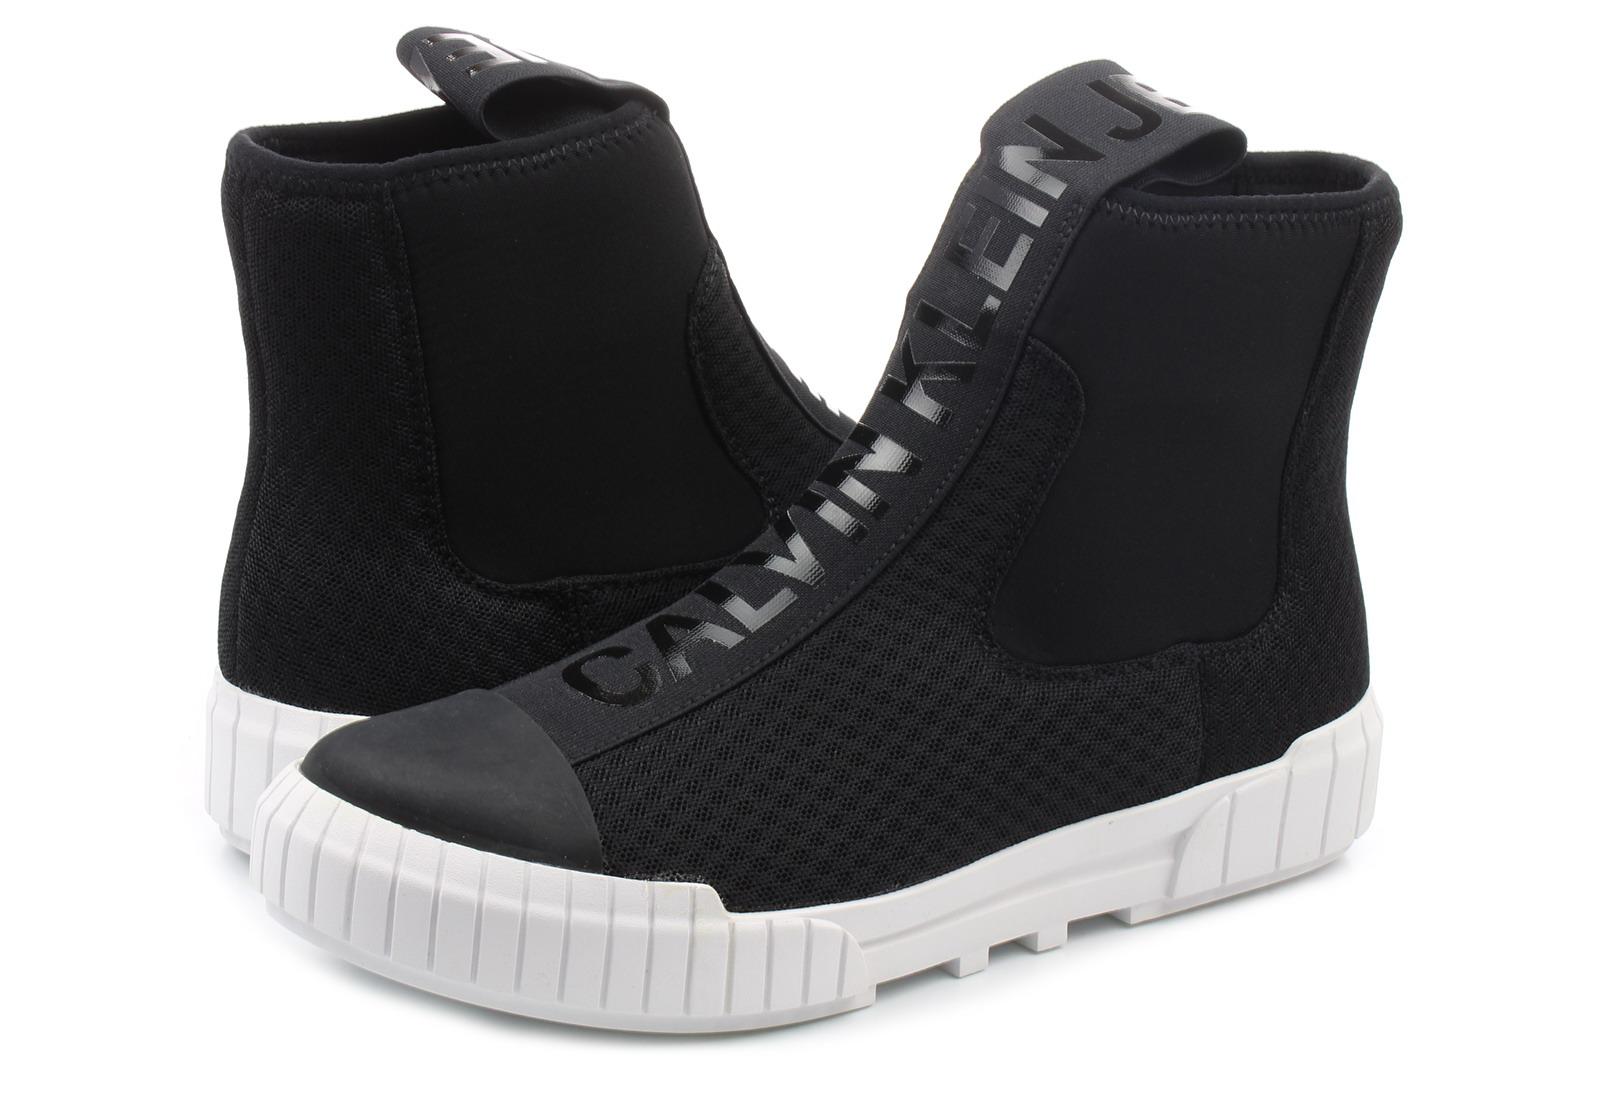 Calvin Klein Jeans Topánky - Bardo - S1738-BLK - Tenisky 4bf06516379